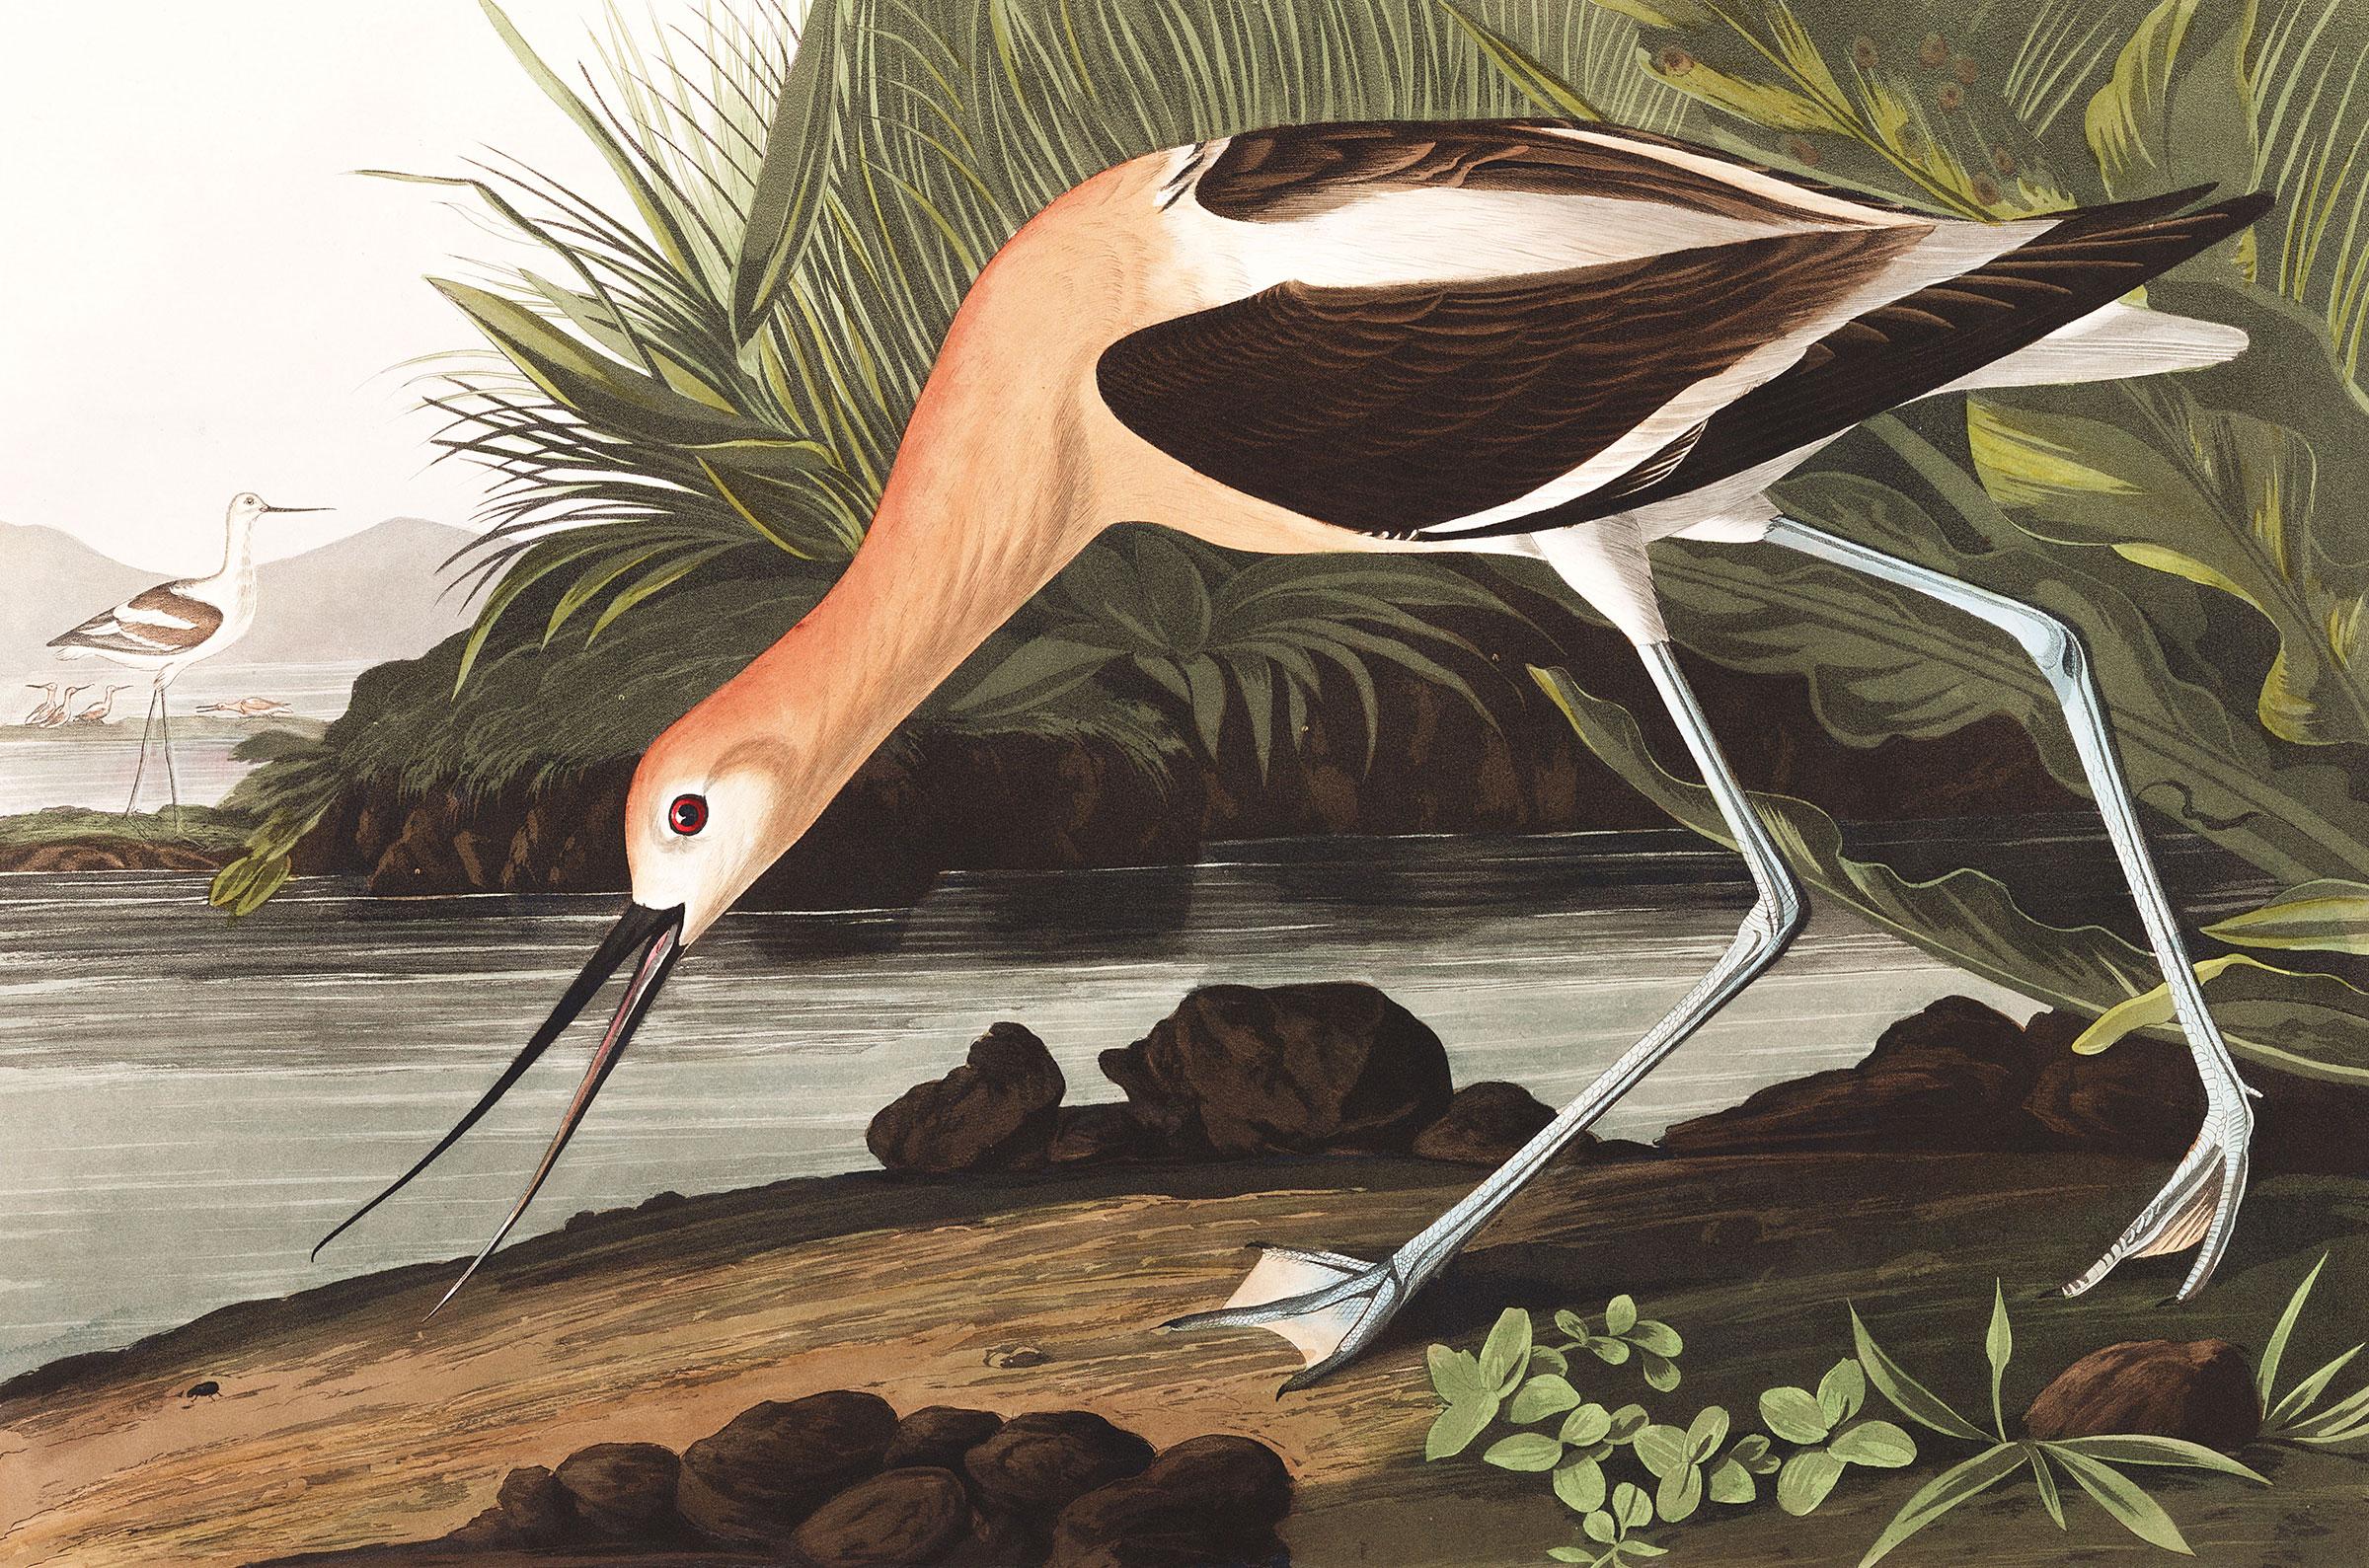 Illustration: Courtesy of the John James Audubon Center at Mill Grove, Montgomery County Audubon Collection, and Zebra Publishing